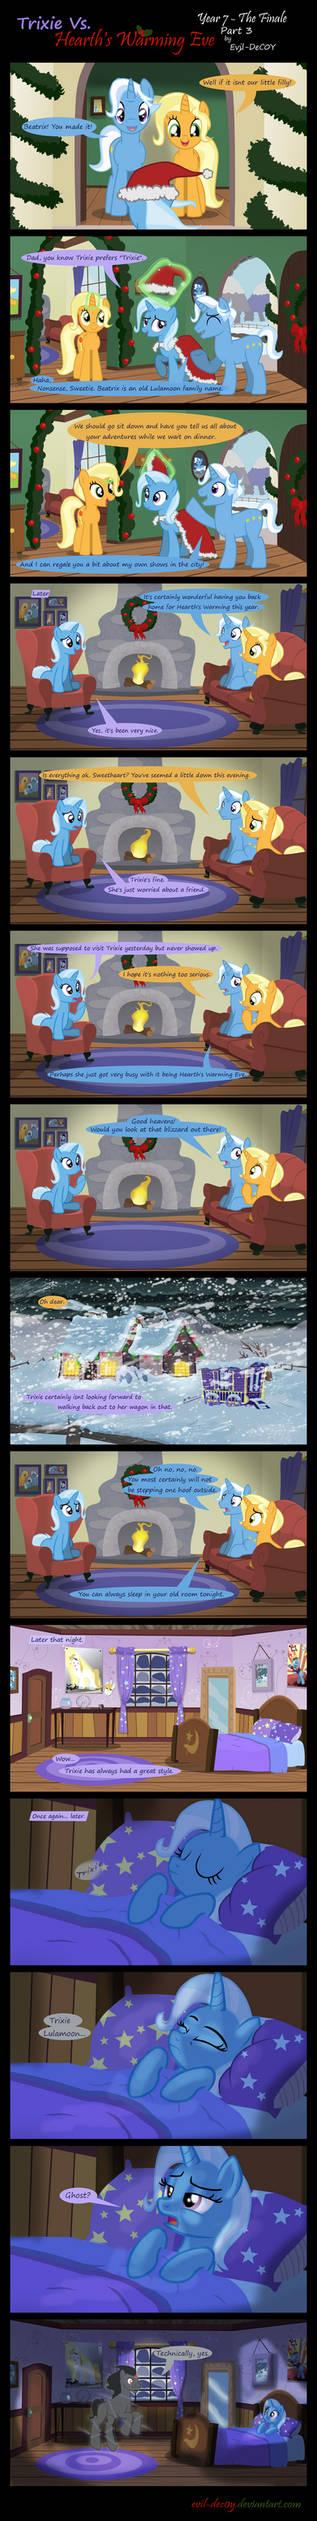 Trixie Vs. Hearth's Warming Eve: Finale (Part 3) by Evil-DeC0Y